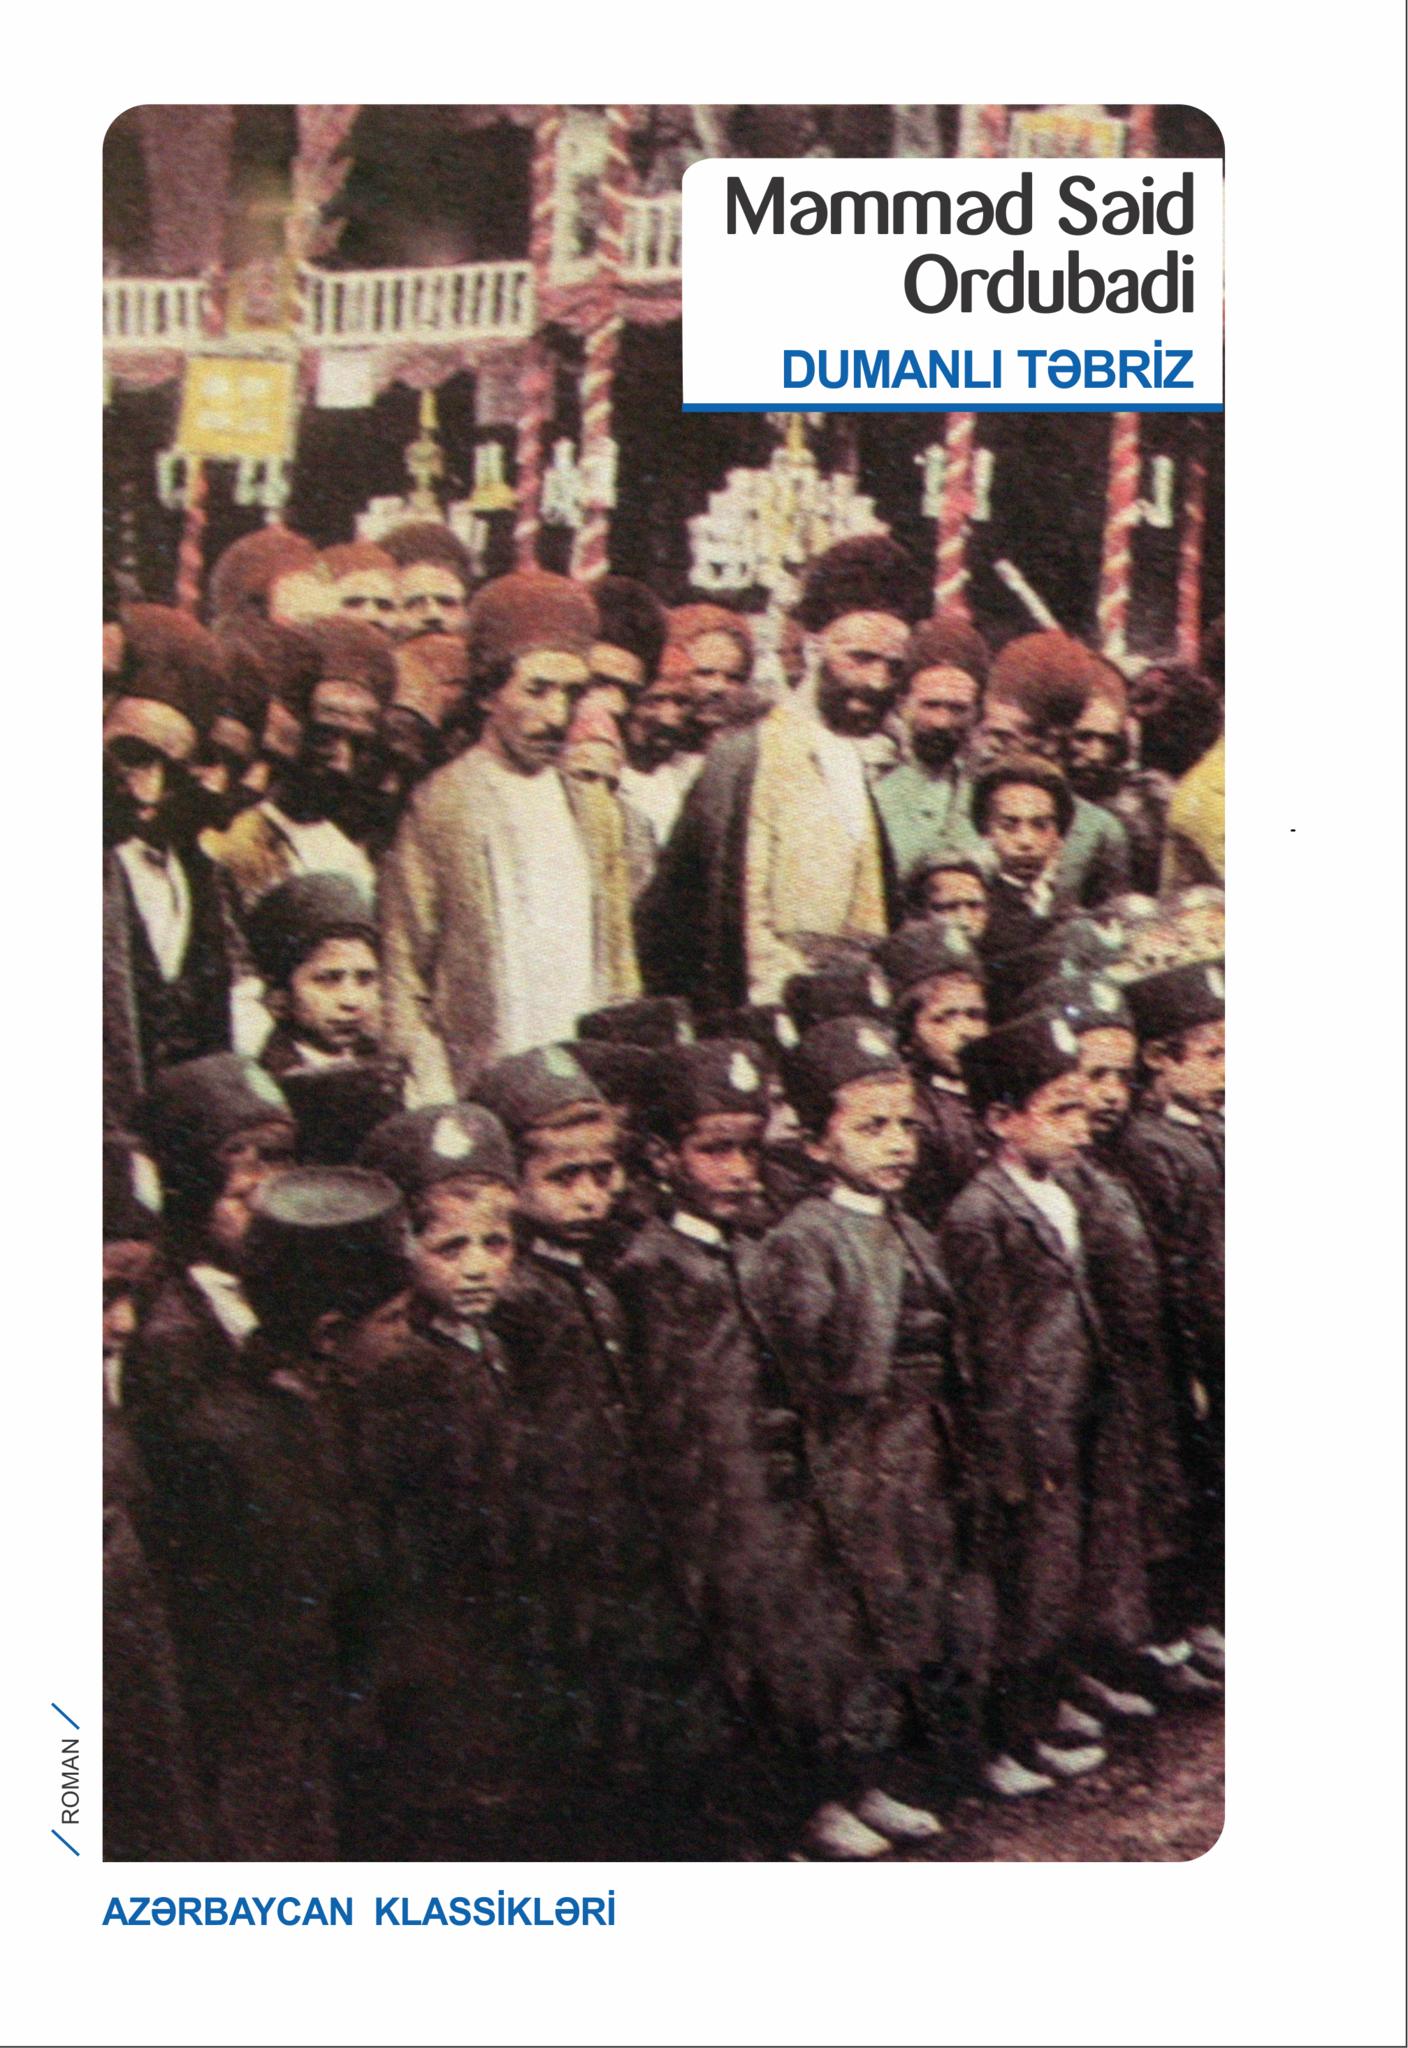 Dumanlı Təbriz